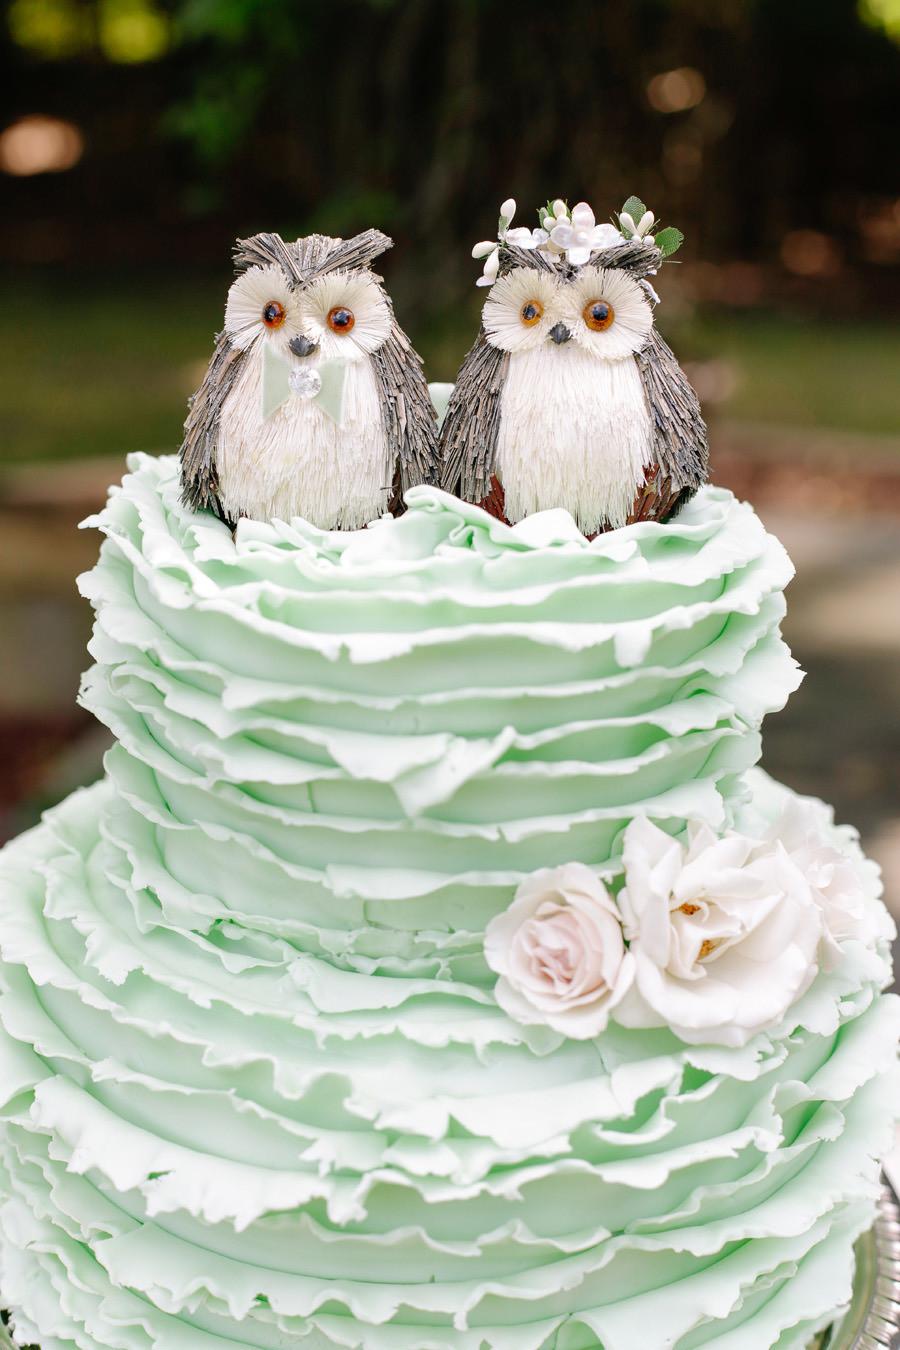 Wedding Cakes Ideas  New Creative Wedding Cake Ideas MODwedding